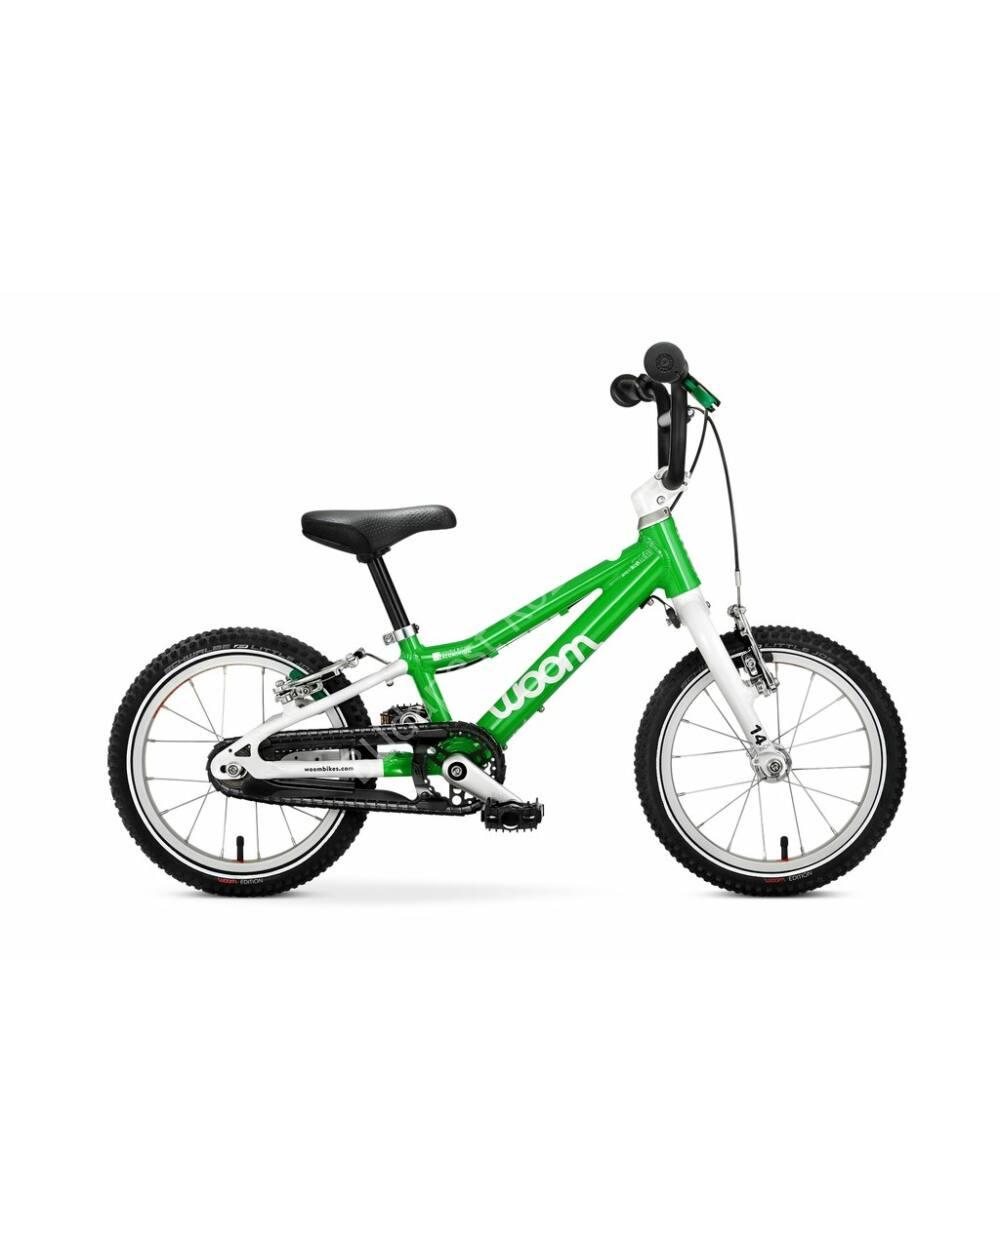 "Woom 2 zöld 14"" gyerek kerékpár, 95-110 cm testmagasság, 5.1 kg"